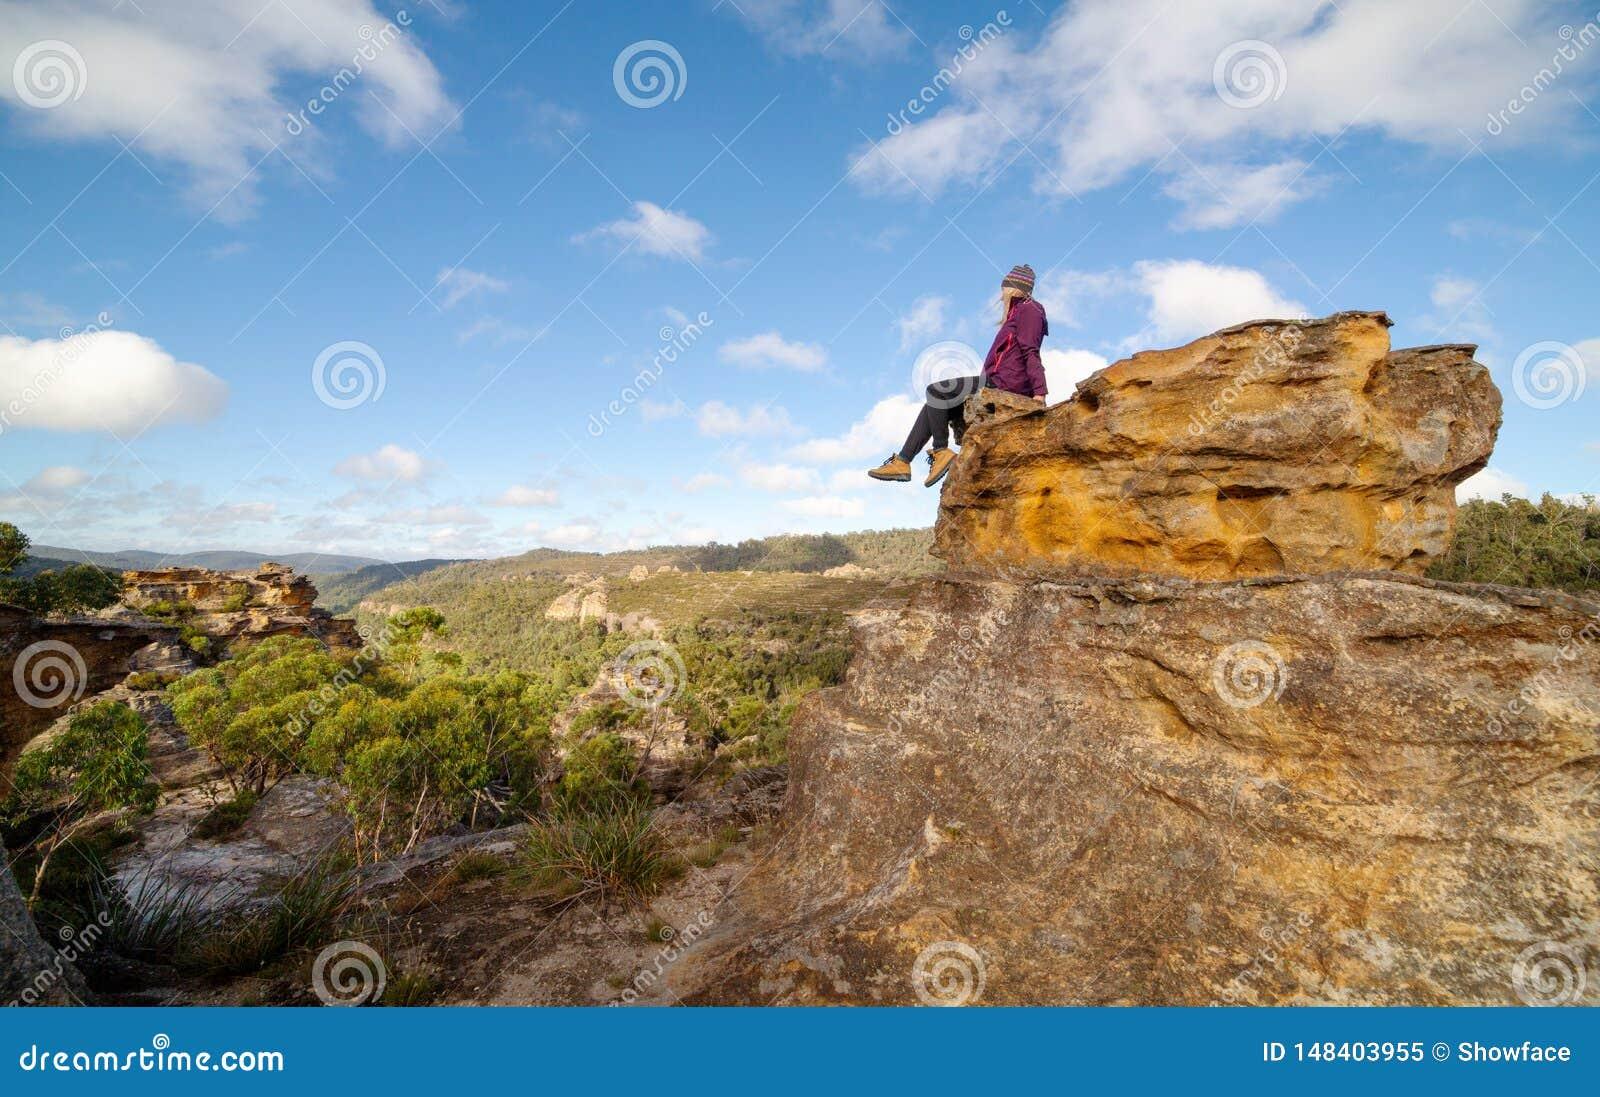 Bushwalker在塔、谷、沟壑和峡谷上面风景坐高